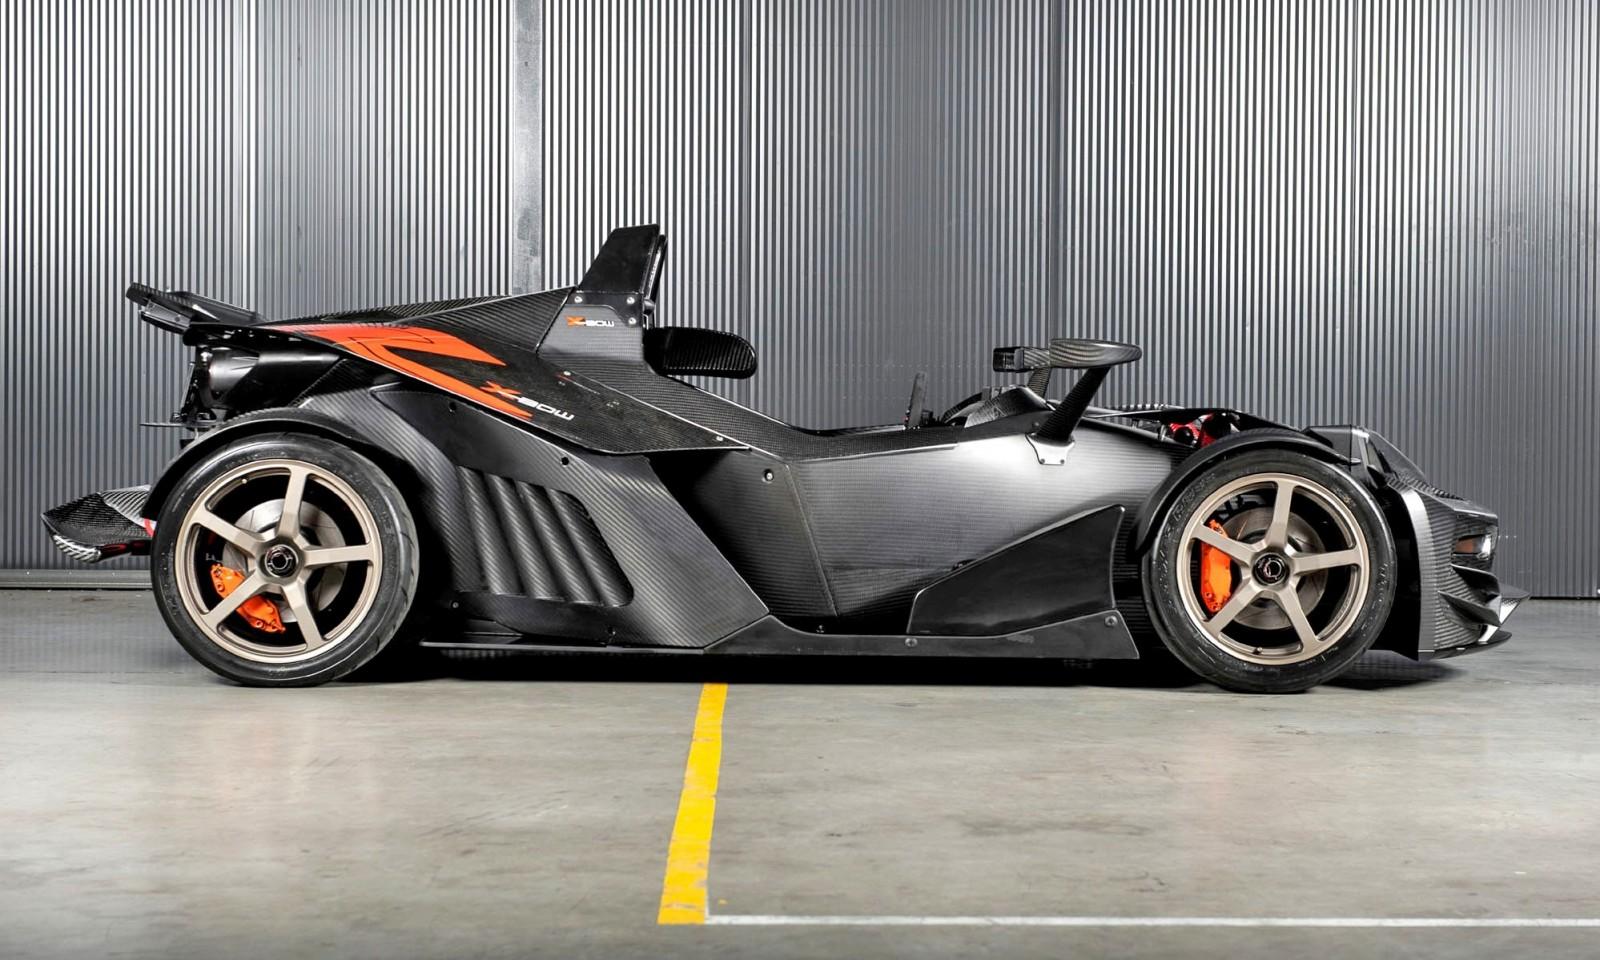 2015 KTM X-Bow RR 11